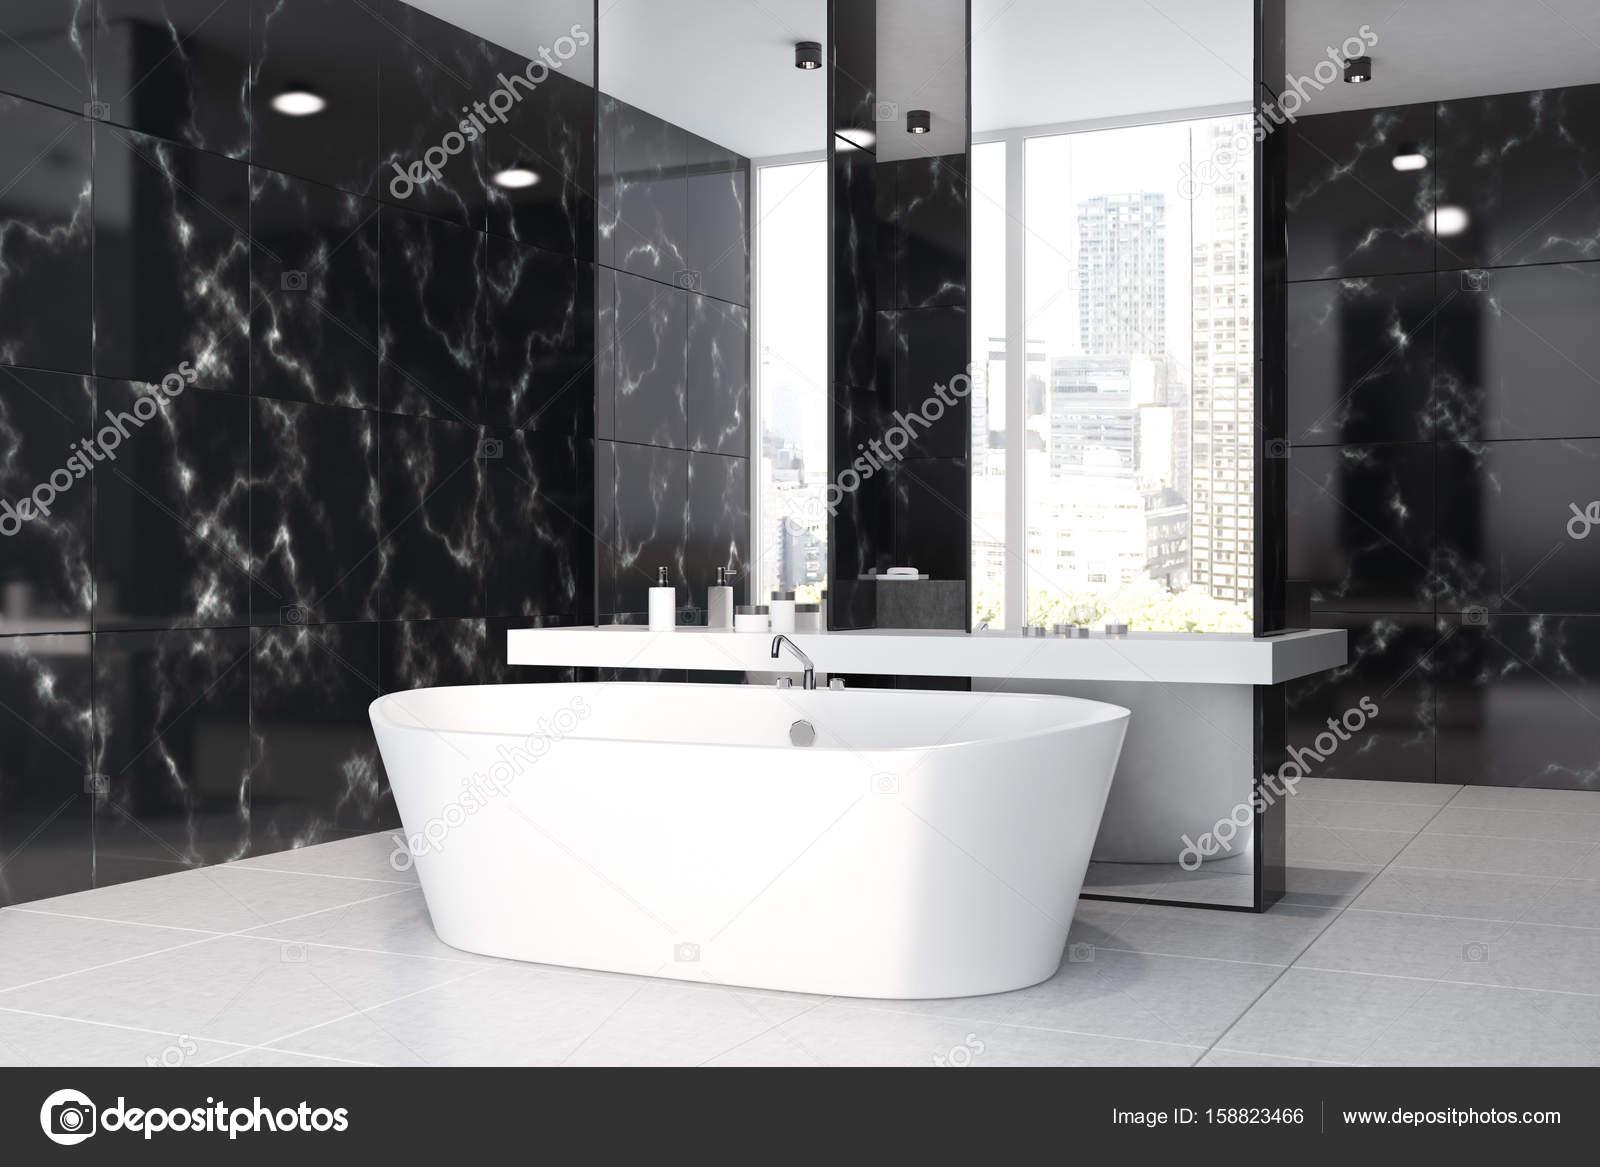 Black marble bathroom image bathroom 2017 for Black marble bathroom